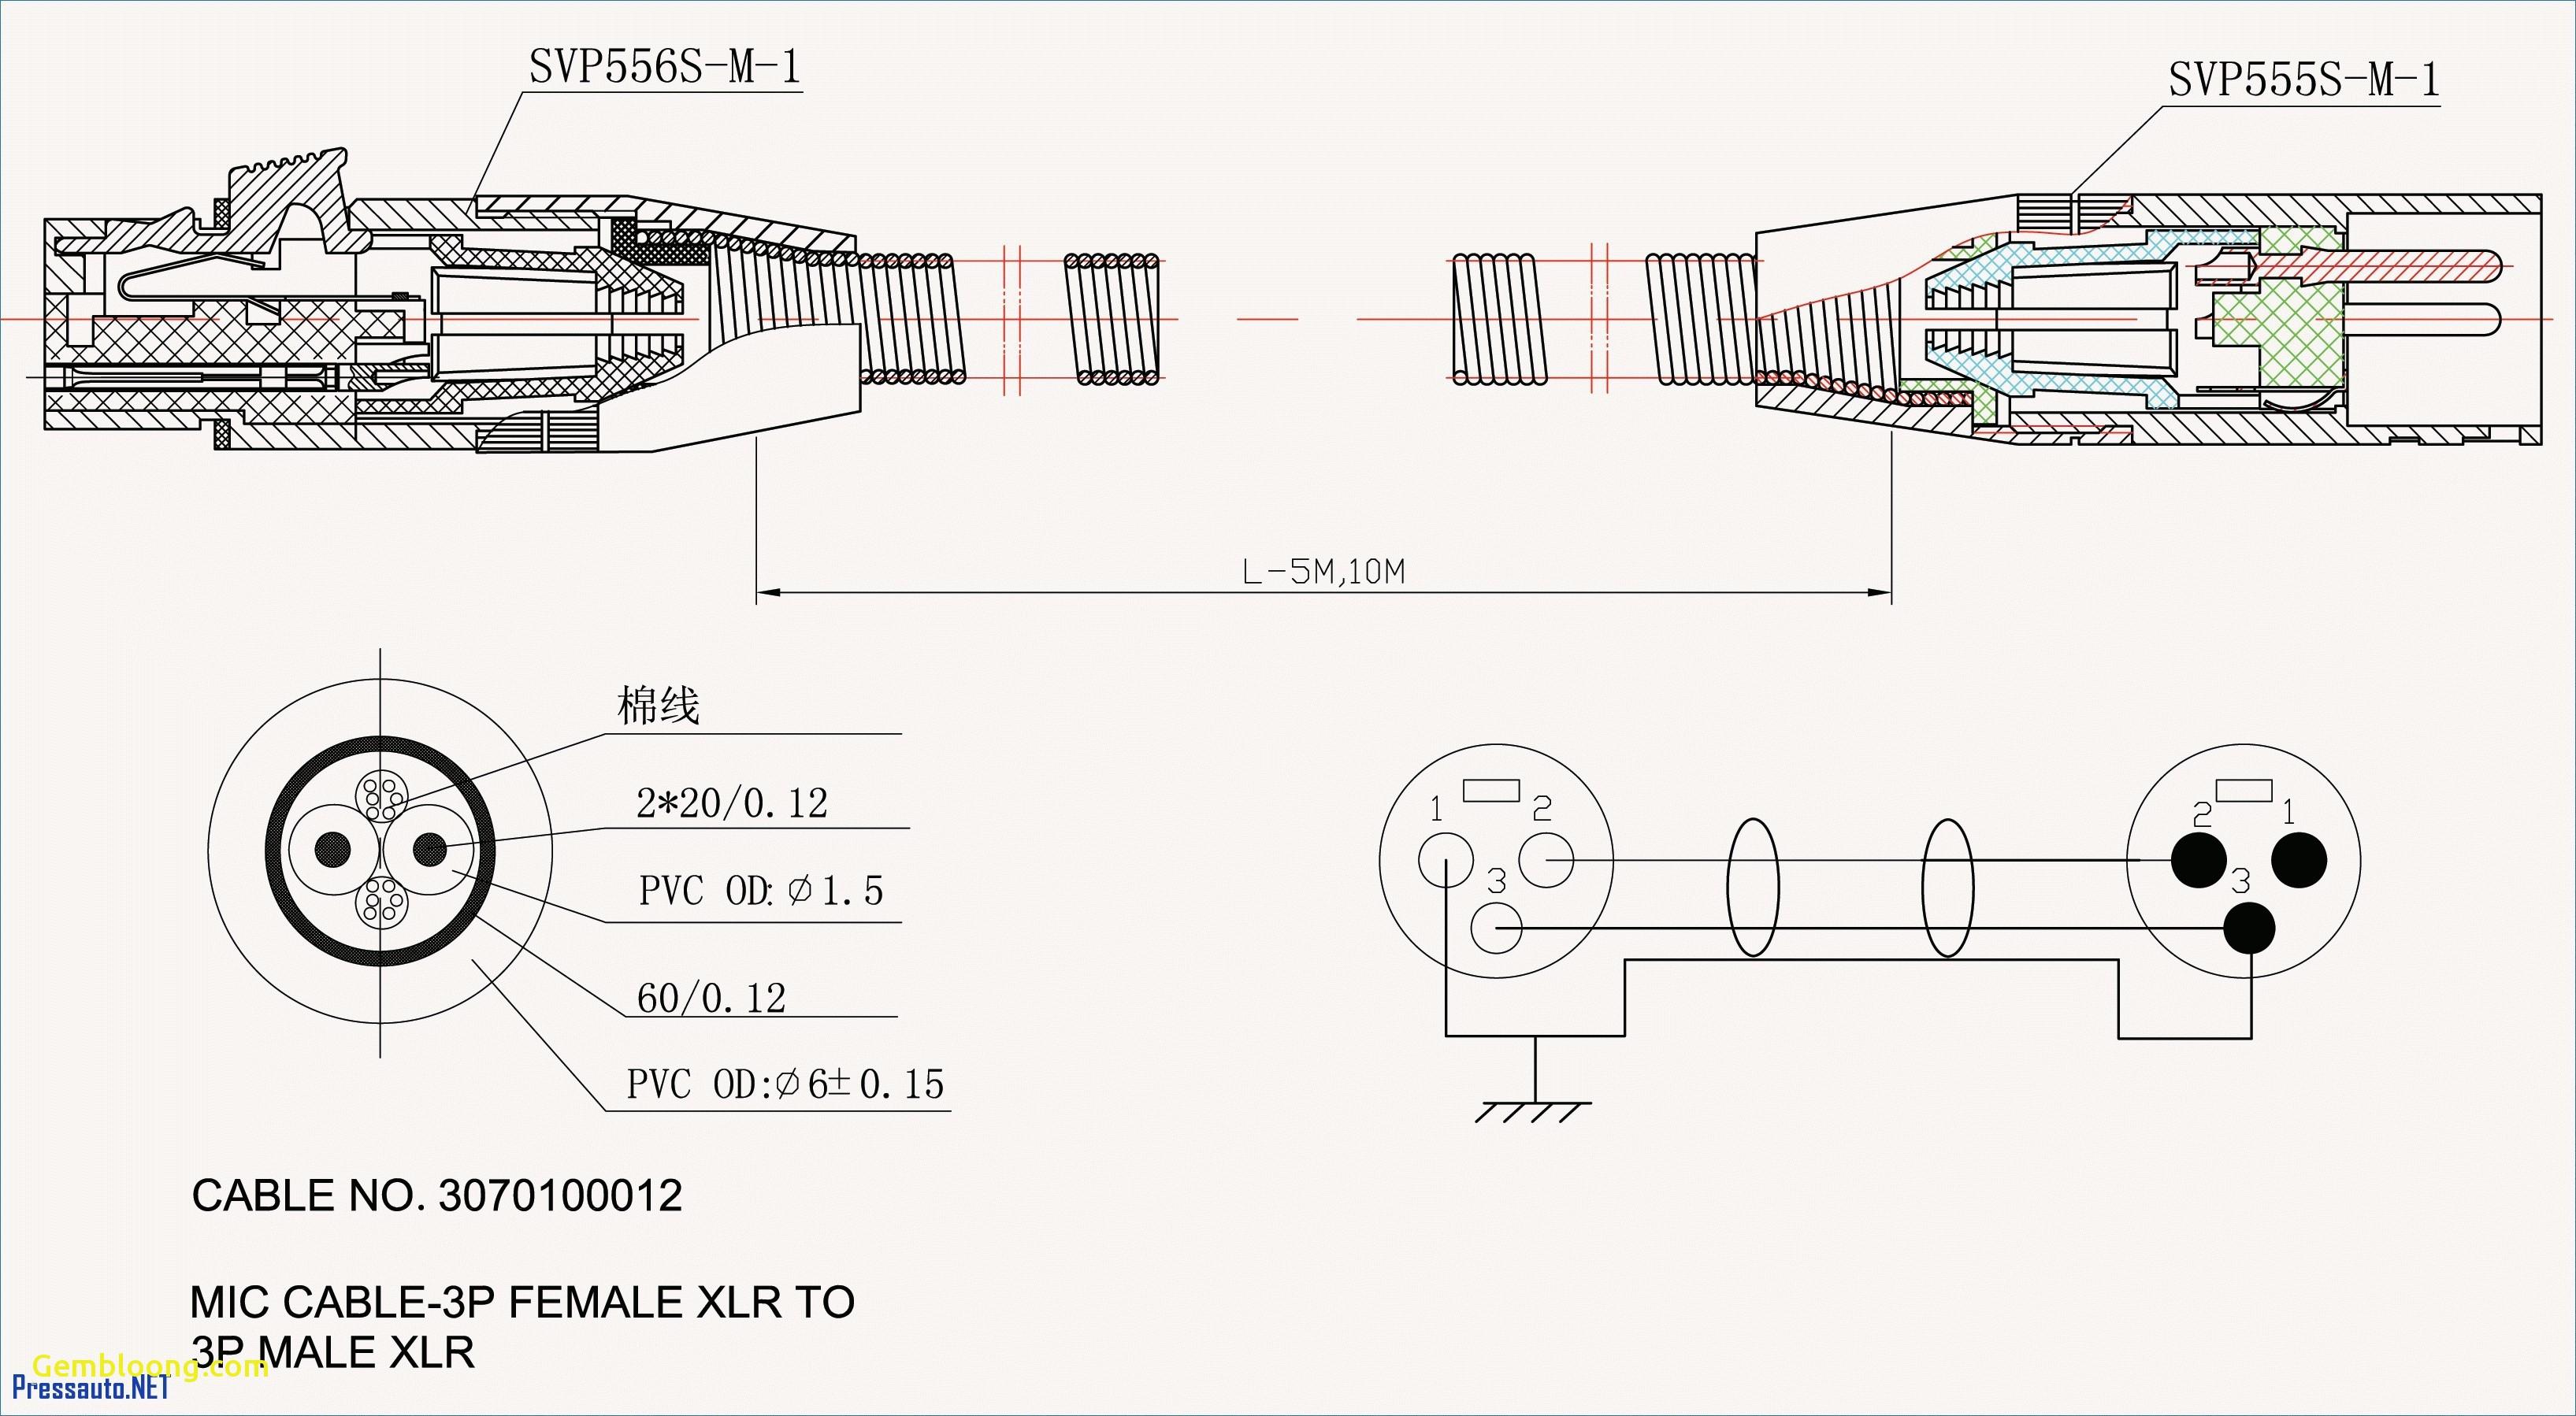 1999 ford Explorer Engine Diagram 94 Windstar Wiring Diagram Of 1999 ford Explorer Engine Diagram